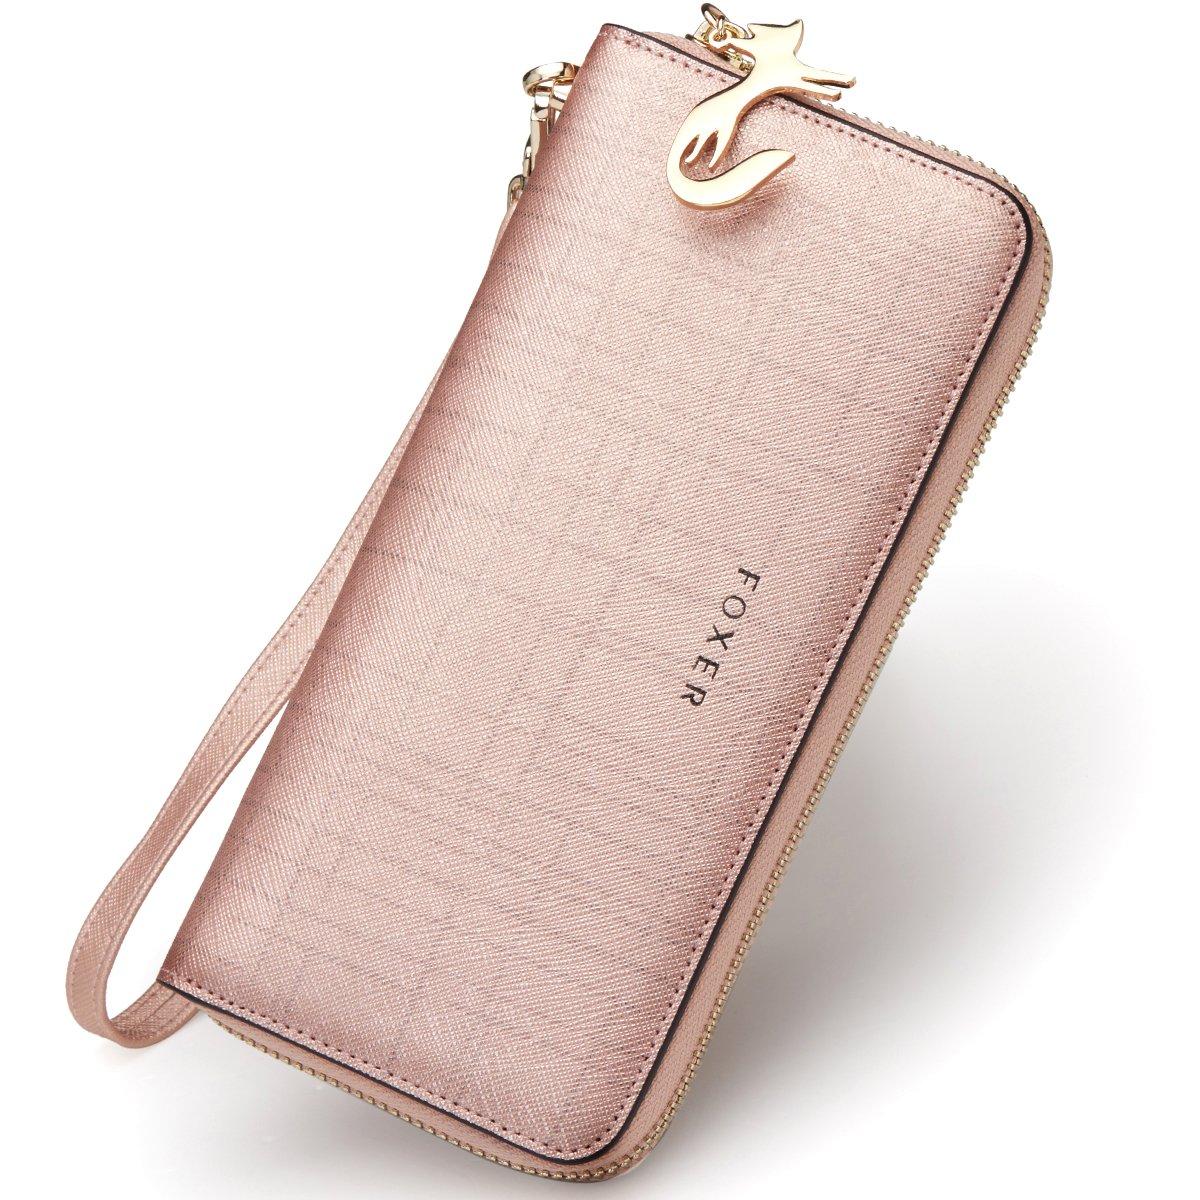 FOXER Women Leather Wallet Bifold Wallet Clutch Wallet with Wristlet (Rose Gold)